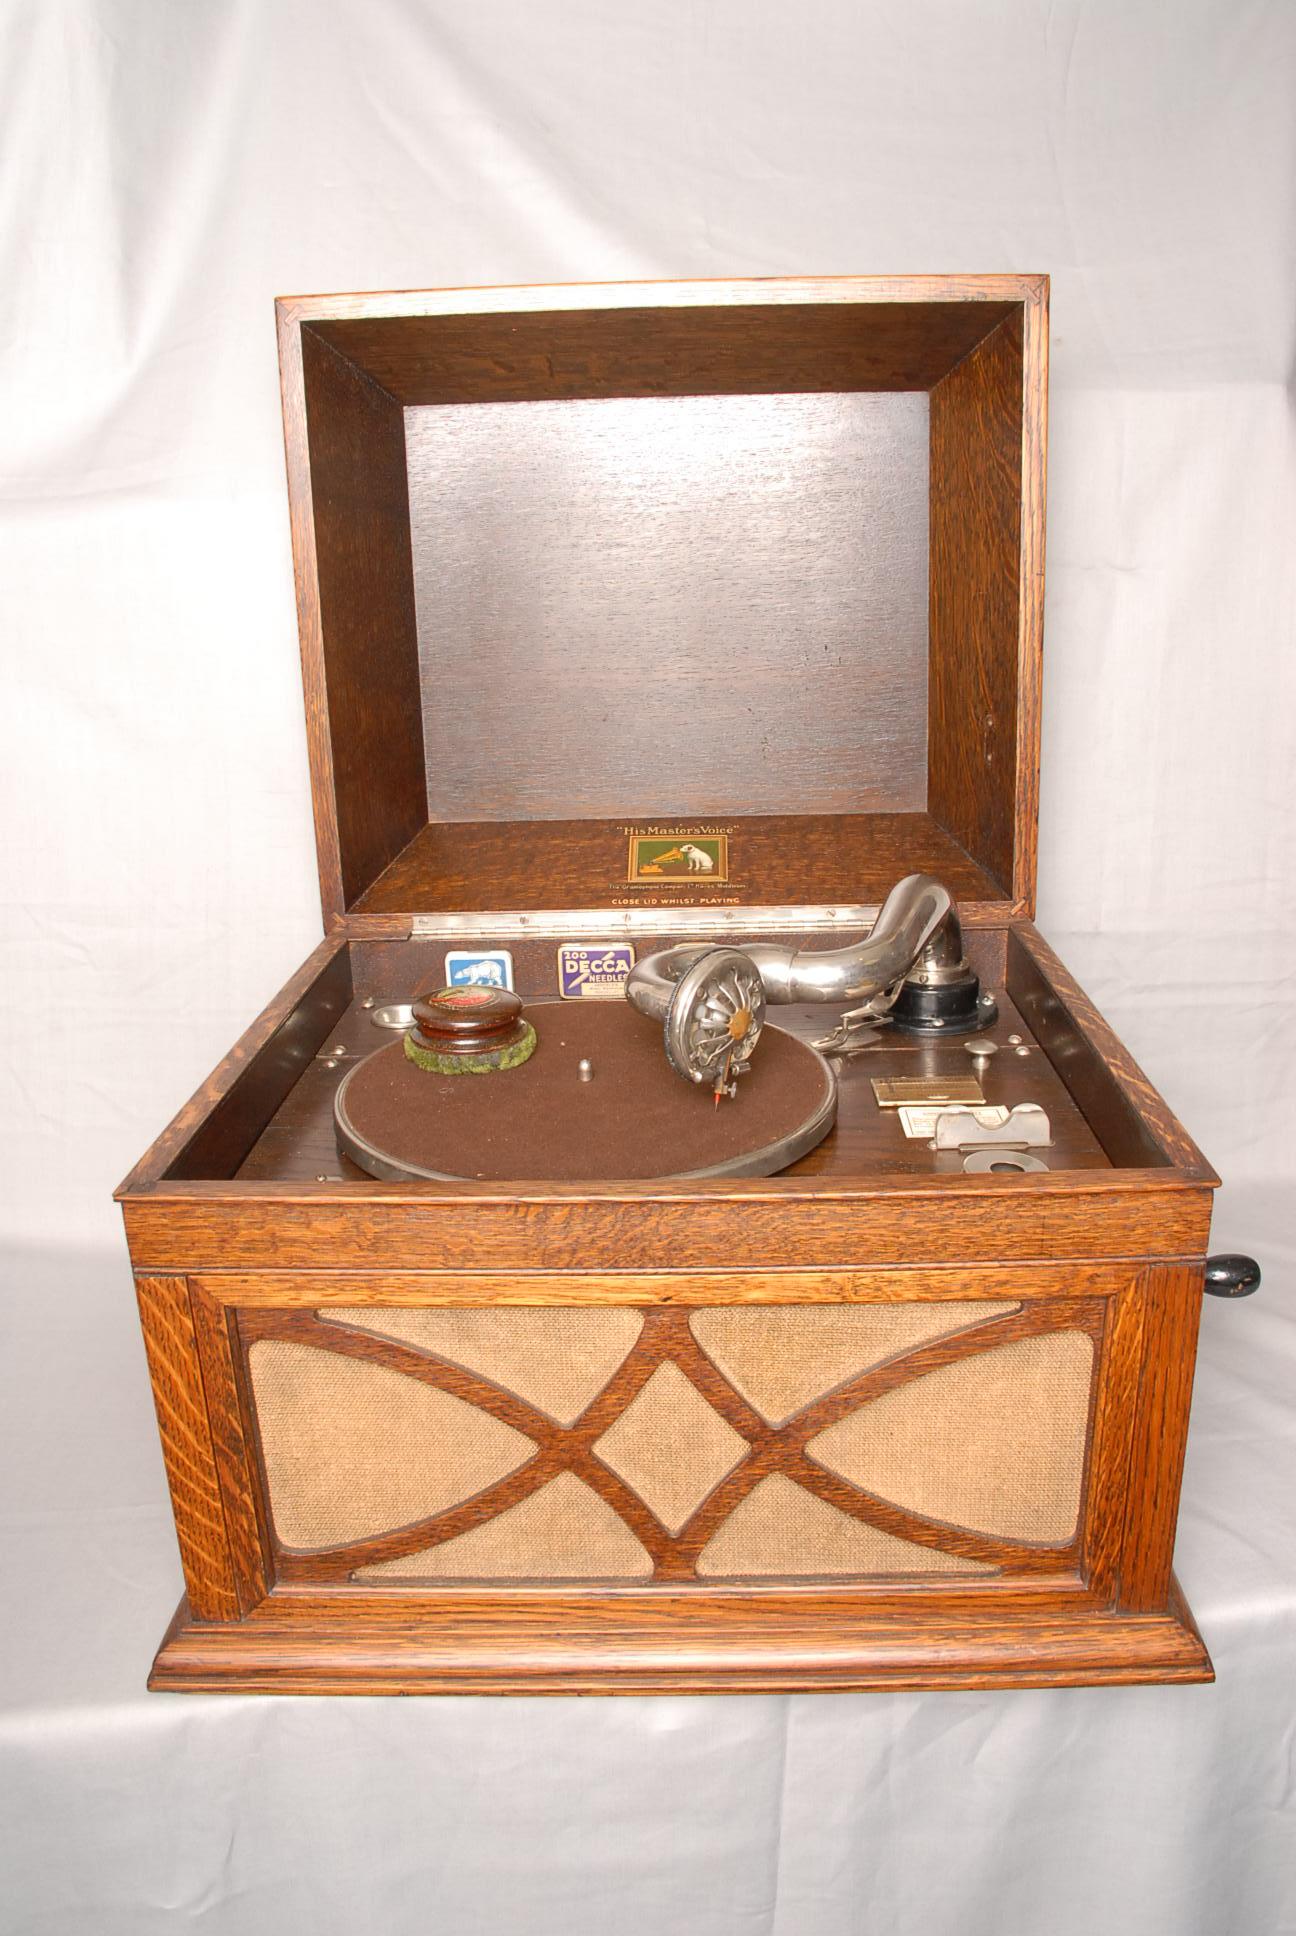 Hmv Gramophone 1932 E2bn Gallery